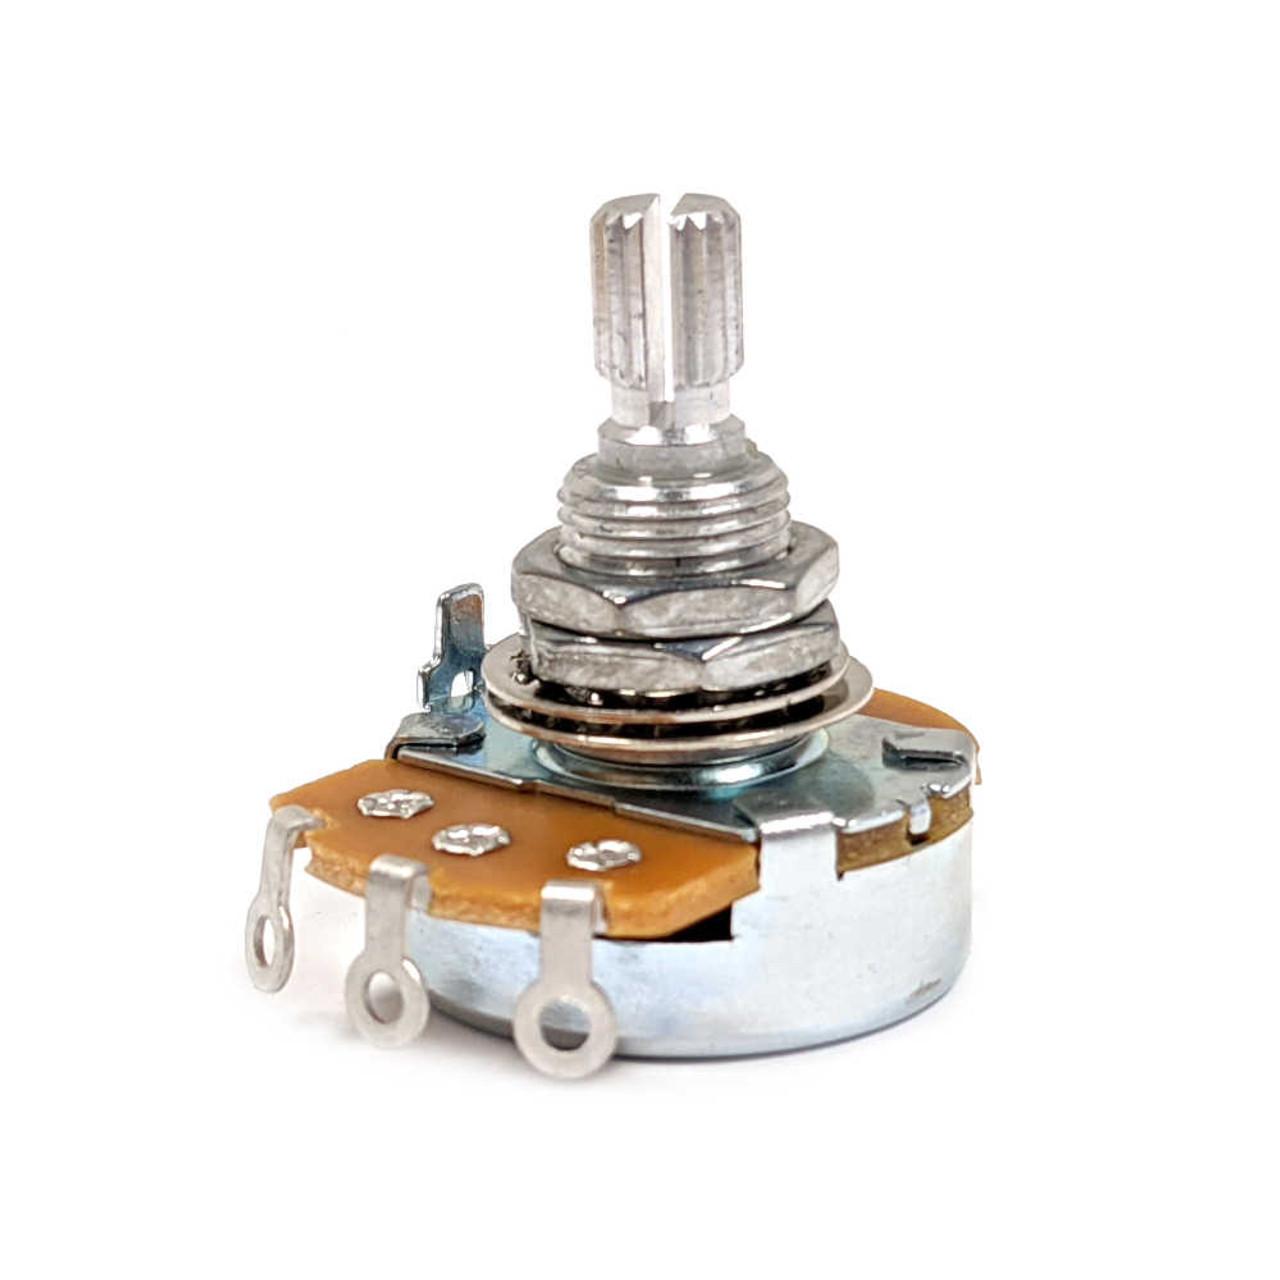 Alpha - Standard 18-Spline Pot (choose taper/resistance)